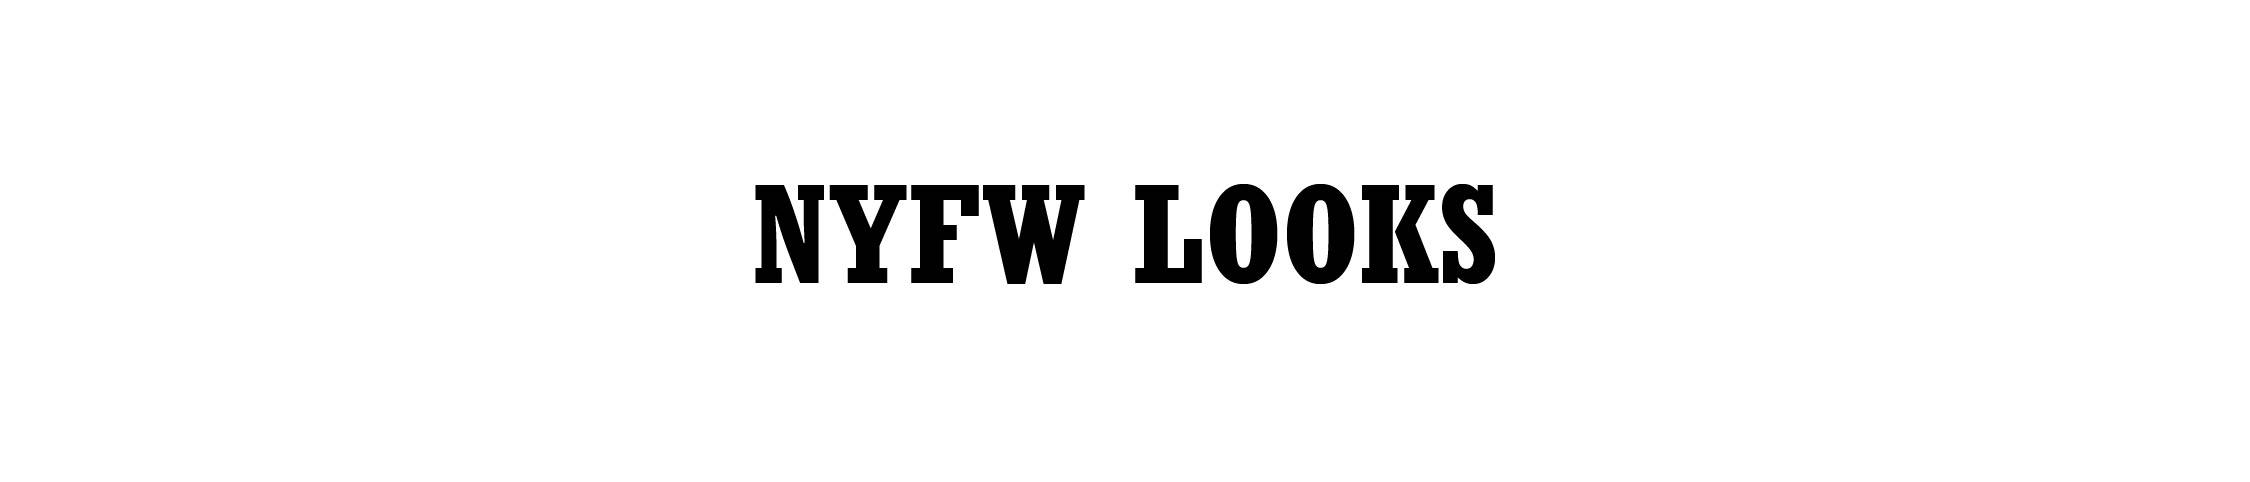 Anna Sui Fashion Show Runway Lookbook